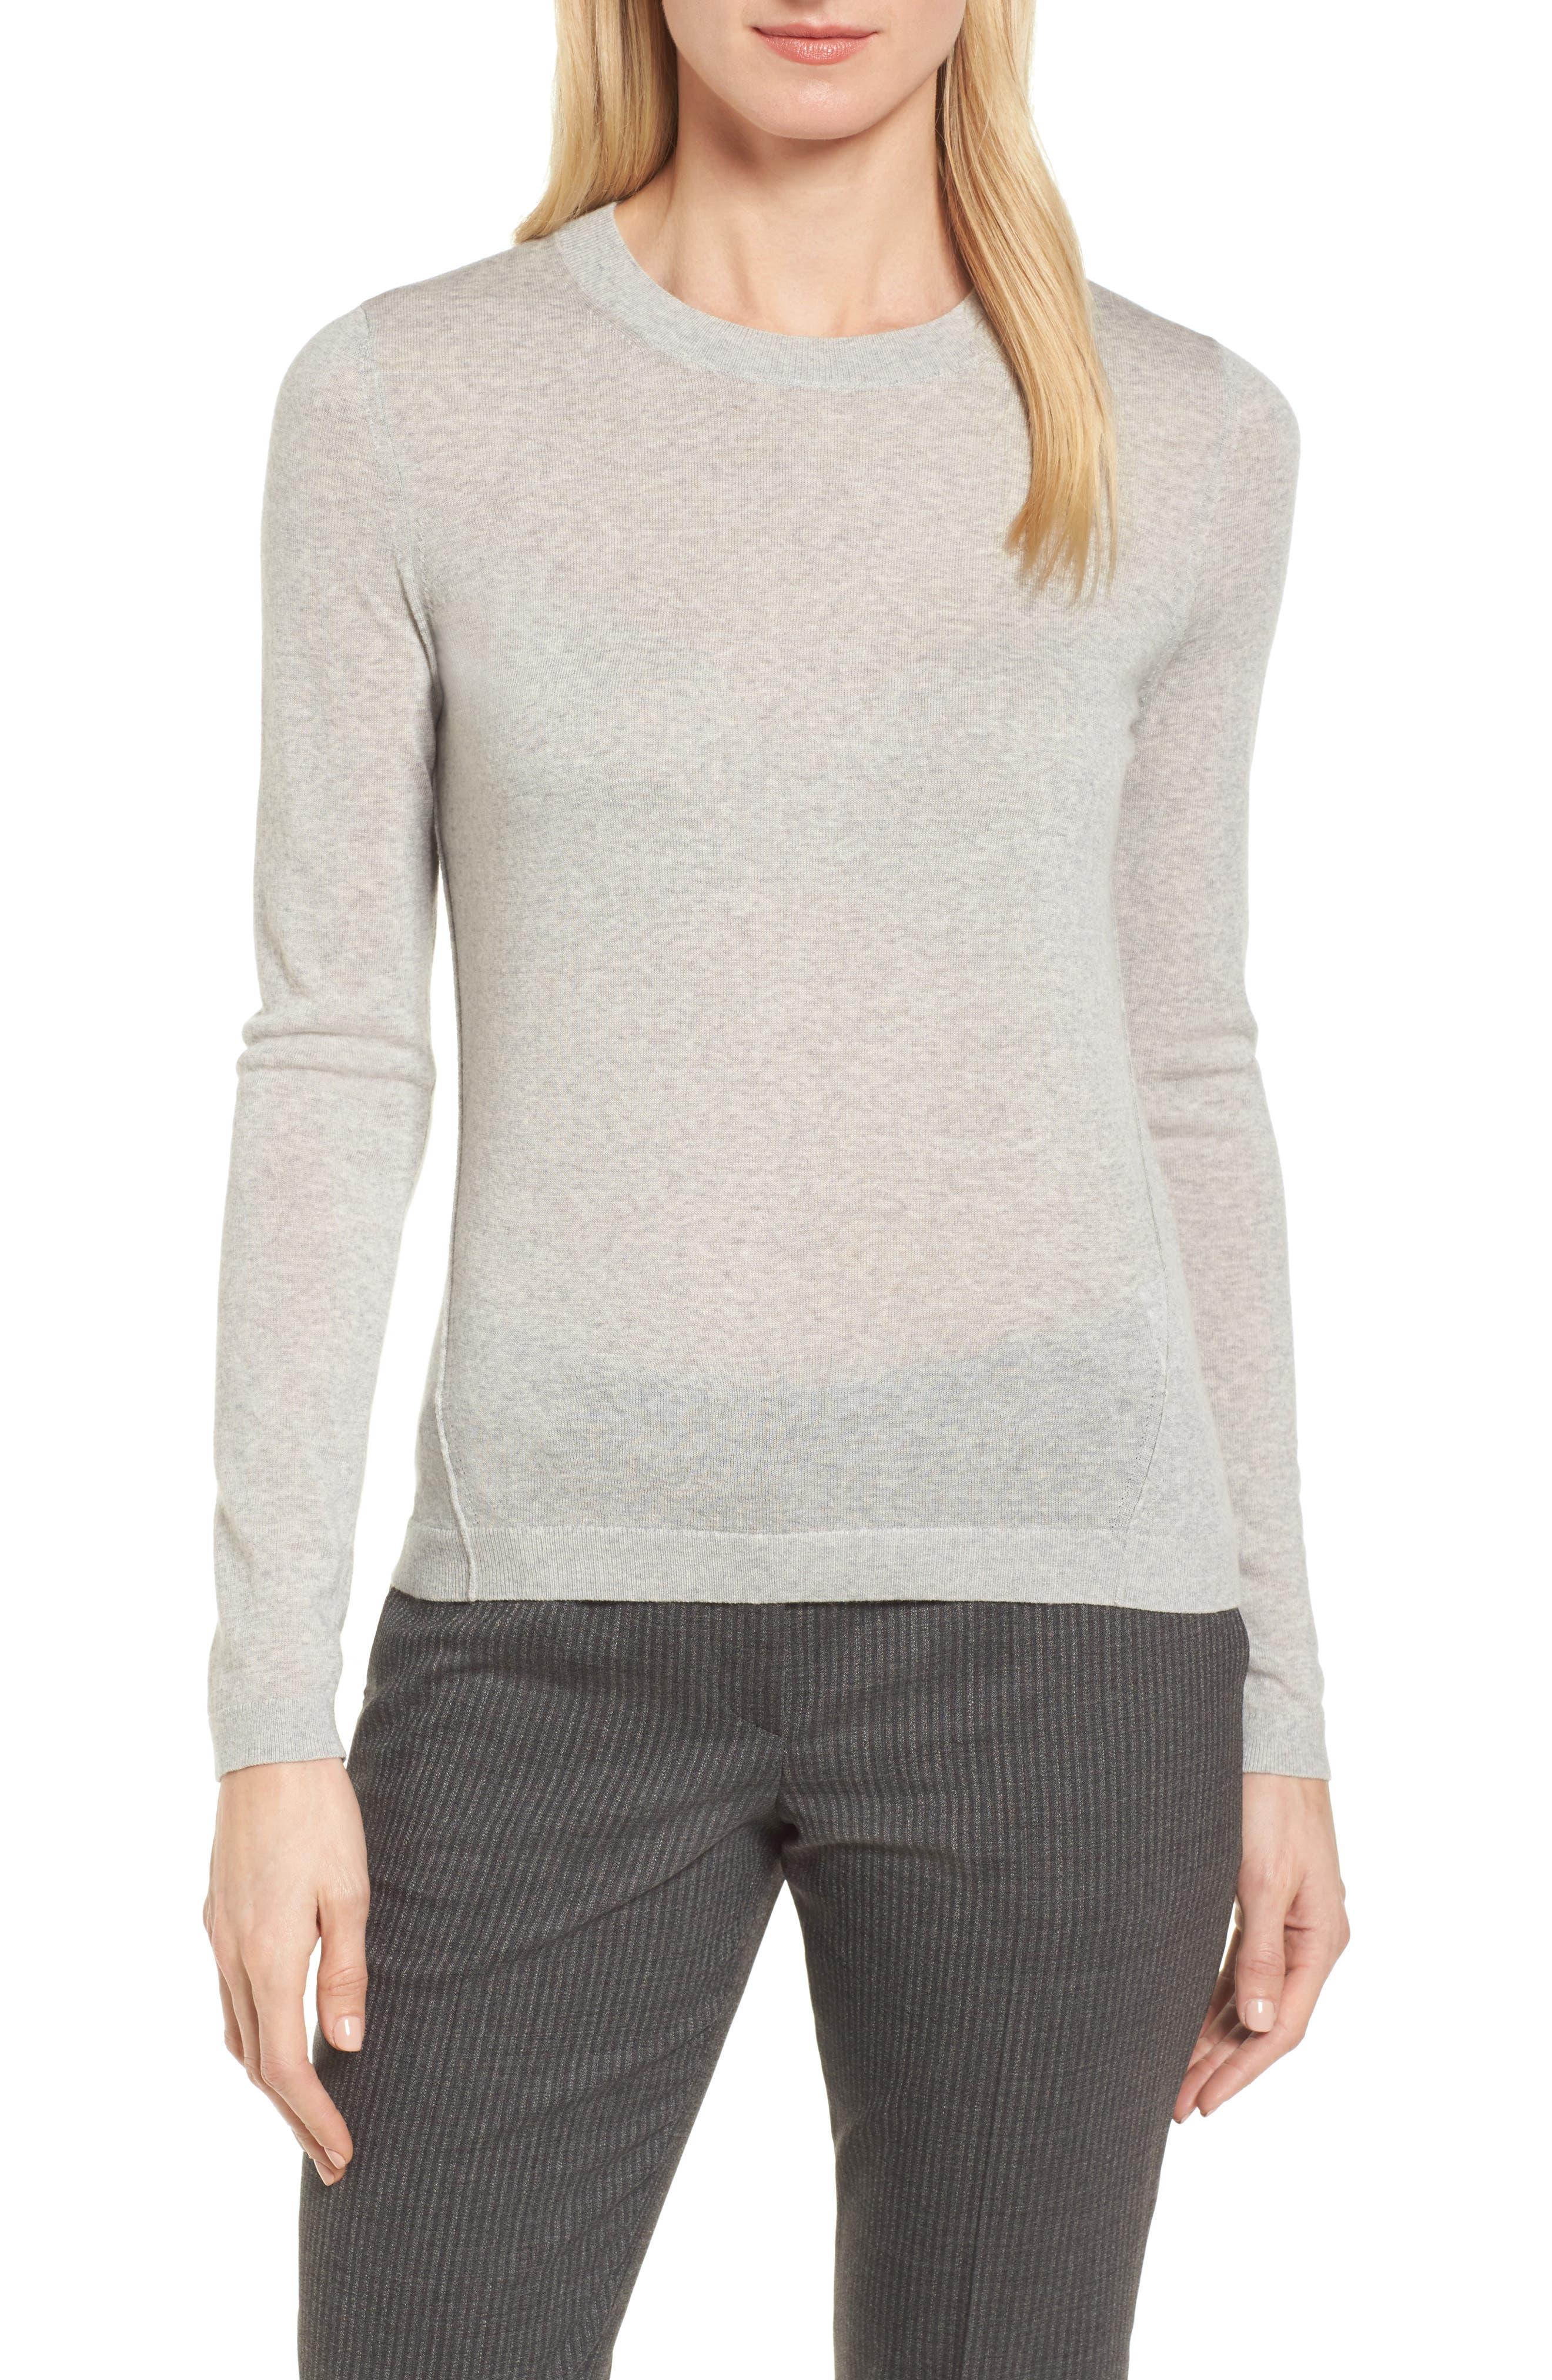 Fayme Wool Crewneck Sweater,                         Main,                         color, Cozy Grey Melange